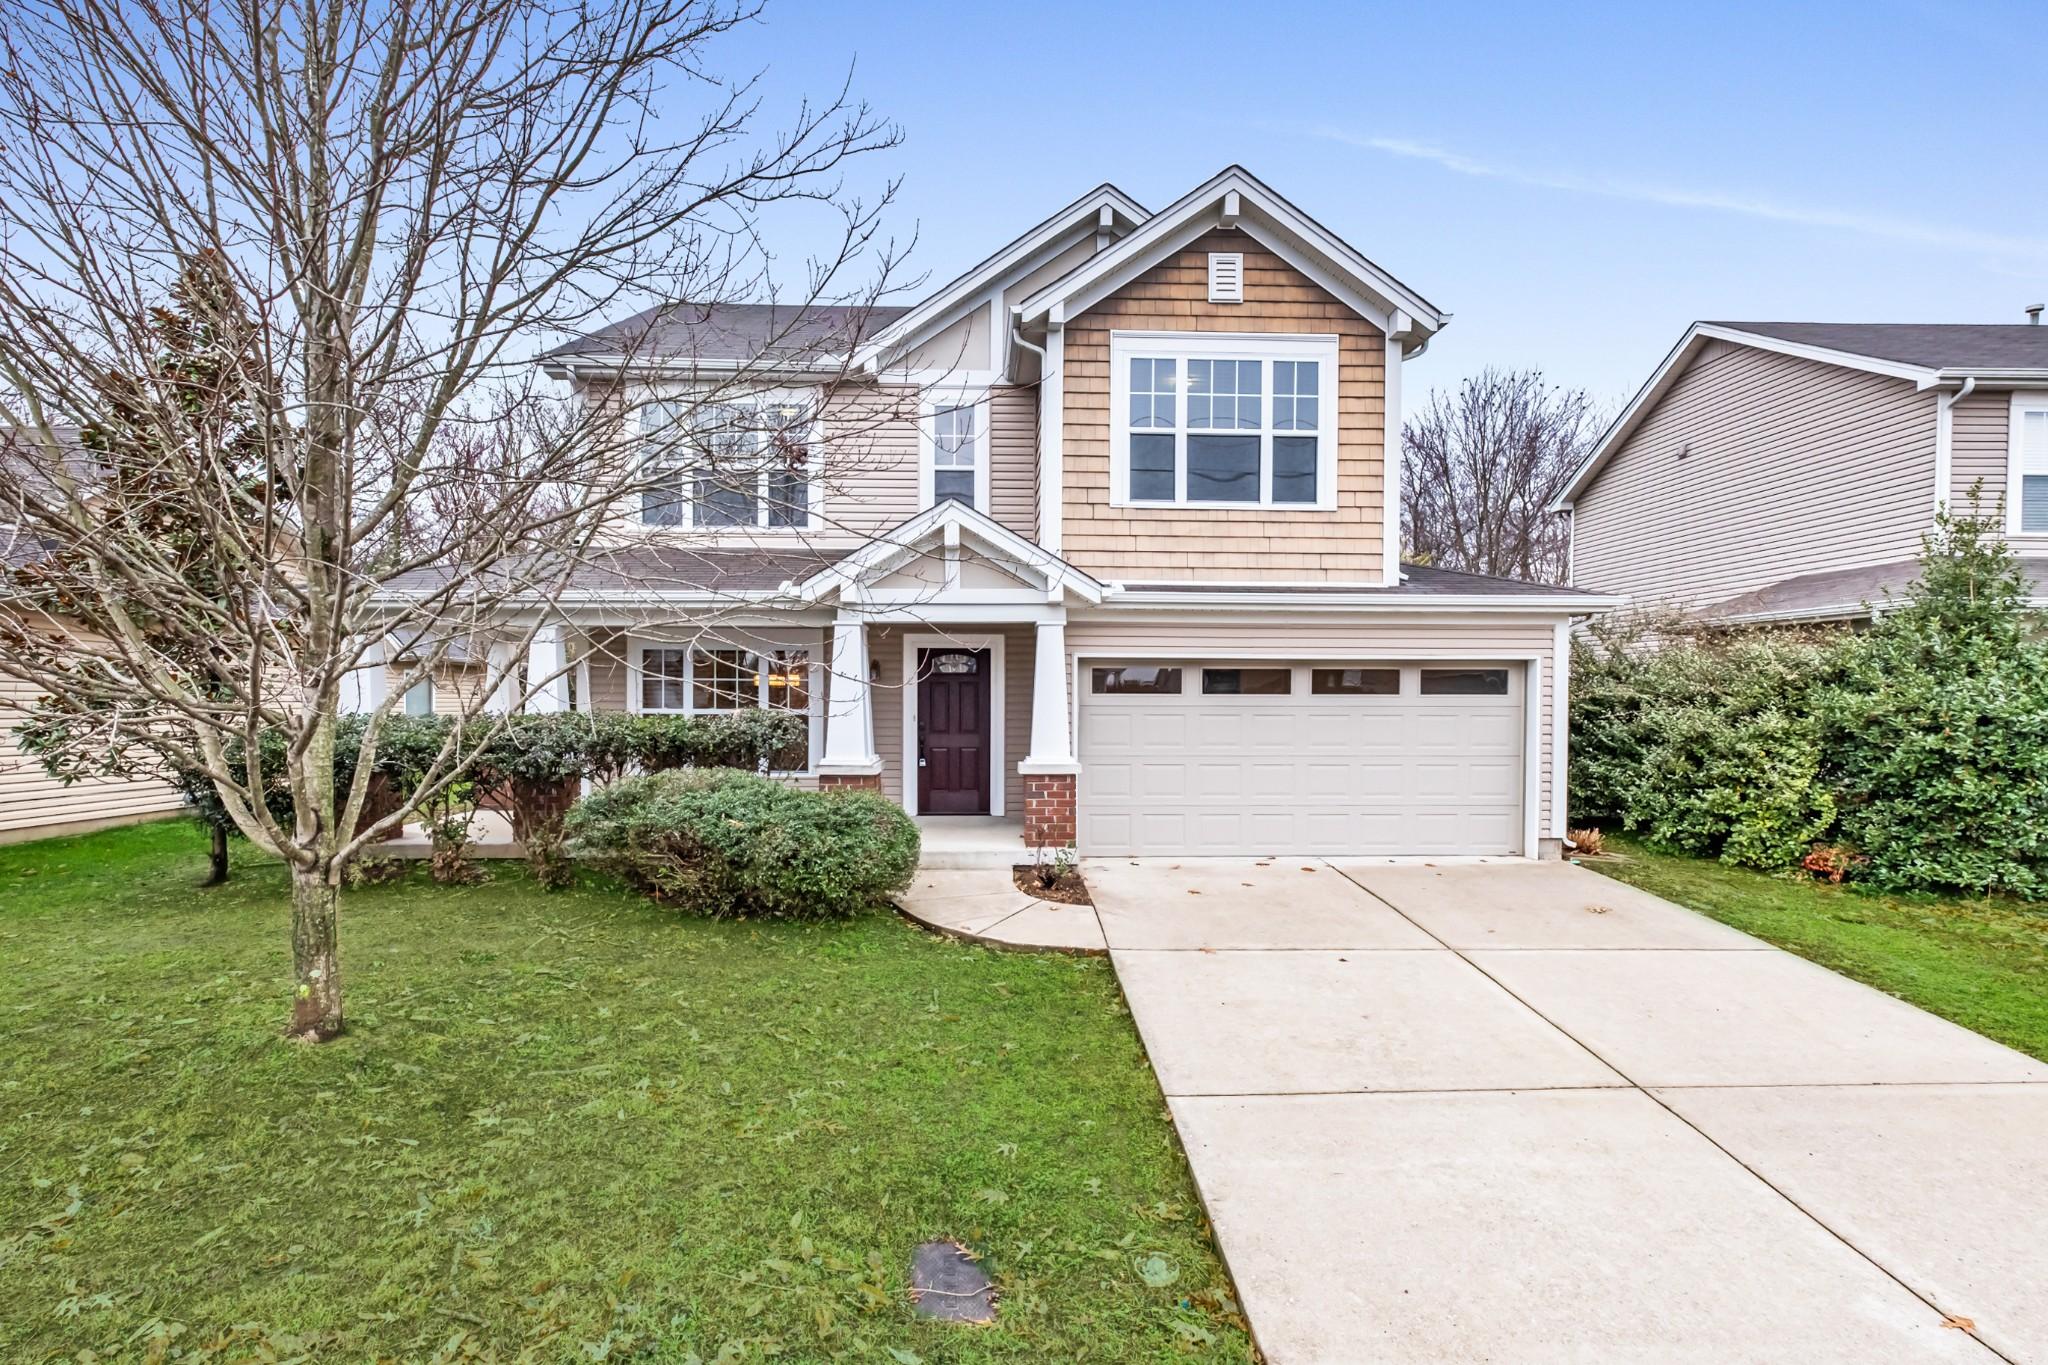 4453 Frost St, Nashville, TN 37214 - Nashville, TN real estate listing